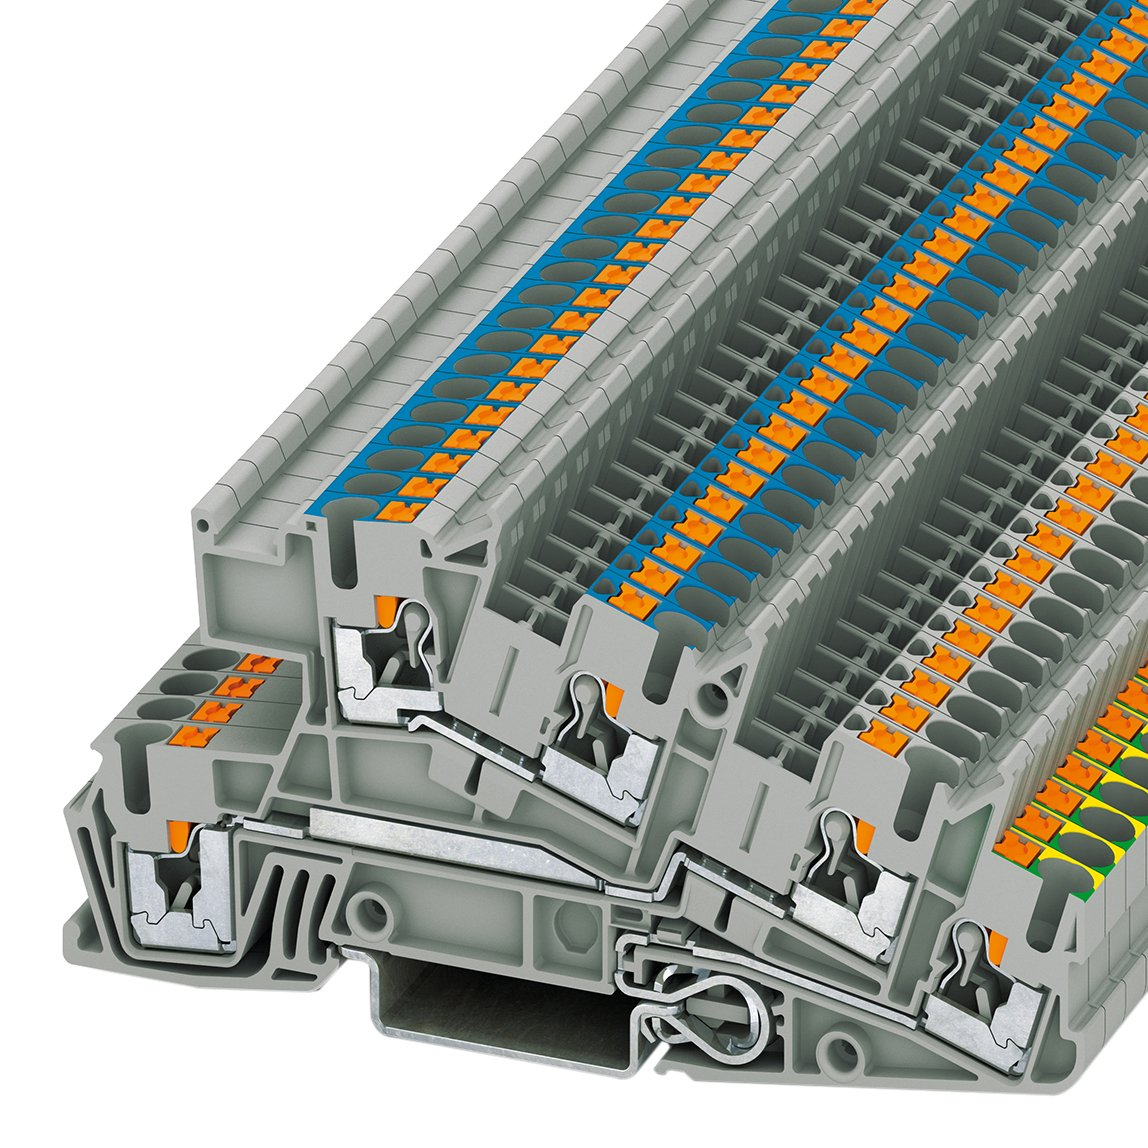 PHOENIX CONTACT Installationsschutzleiterklemme PTI 2,5-PE/L/N, 50 Stü ck, 3213950